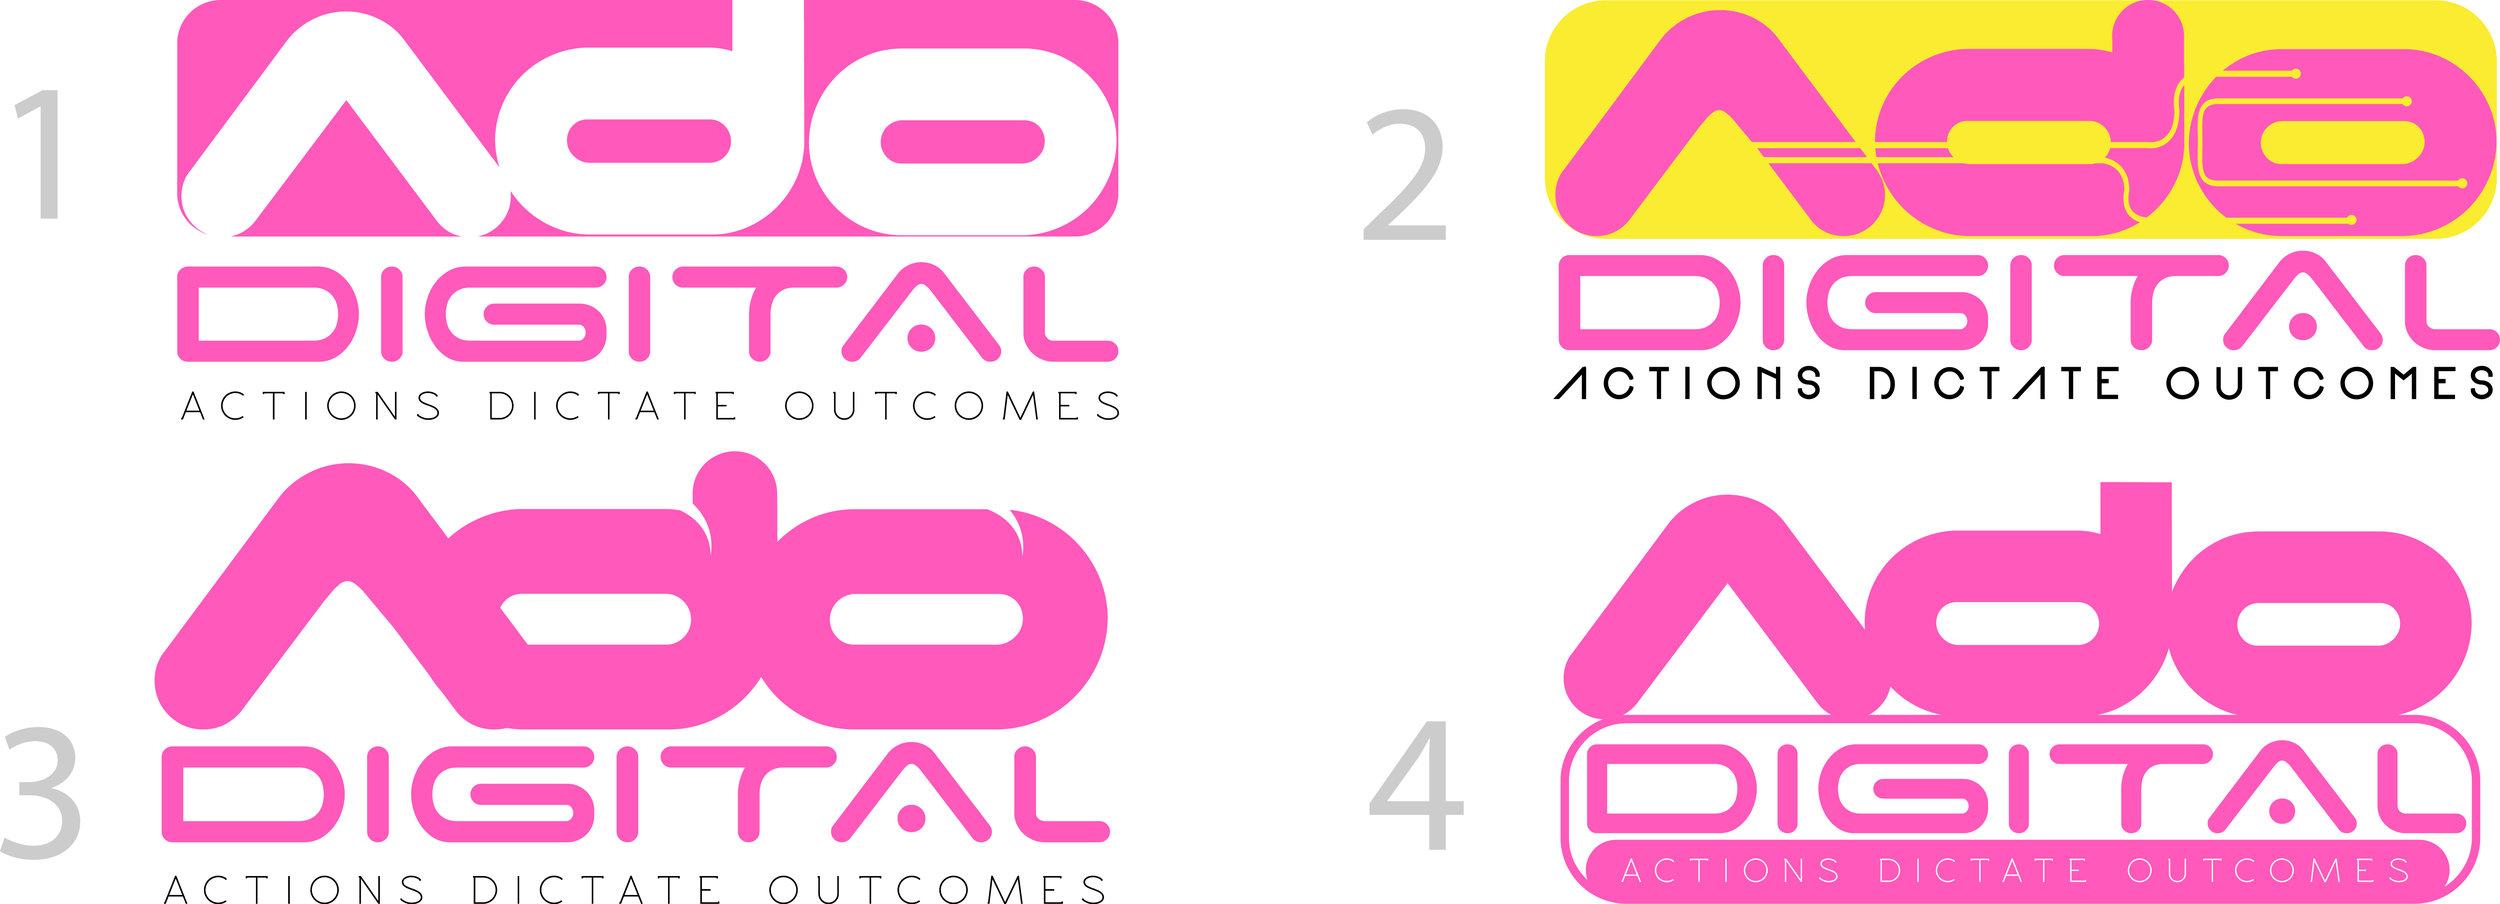 ADO digital Logo 2015 copy.jpg